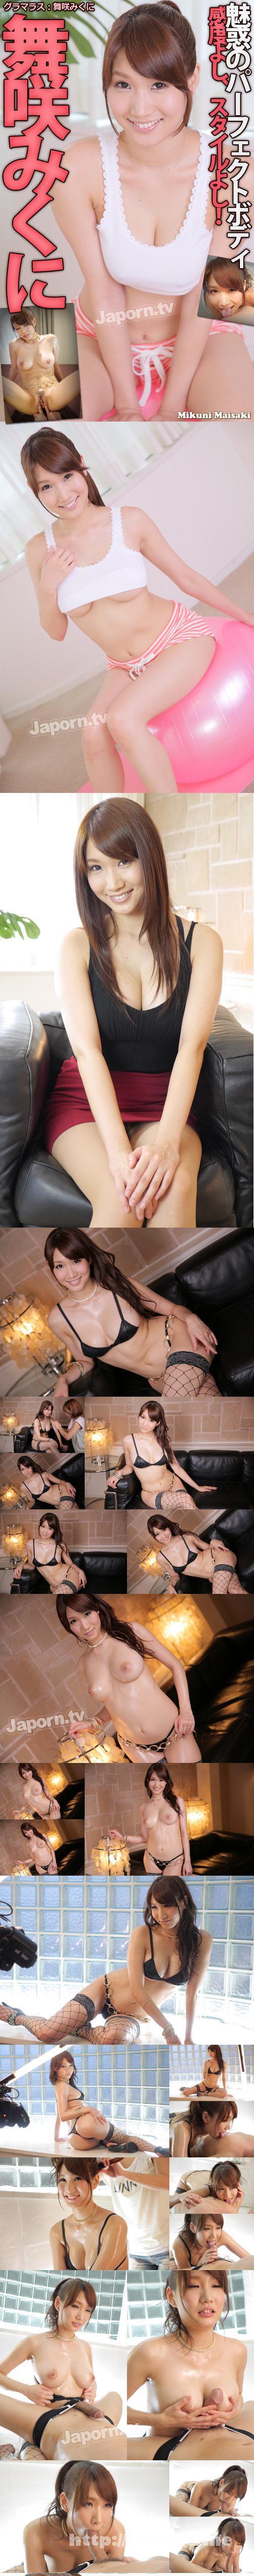 [DRG 09] グラマラス : 舞咲みくに 舞咲みくに Mikuni Maisaki DRG